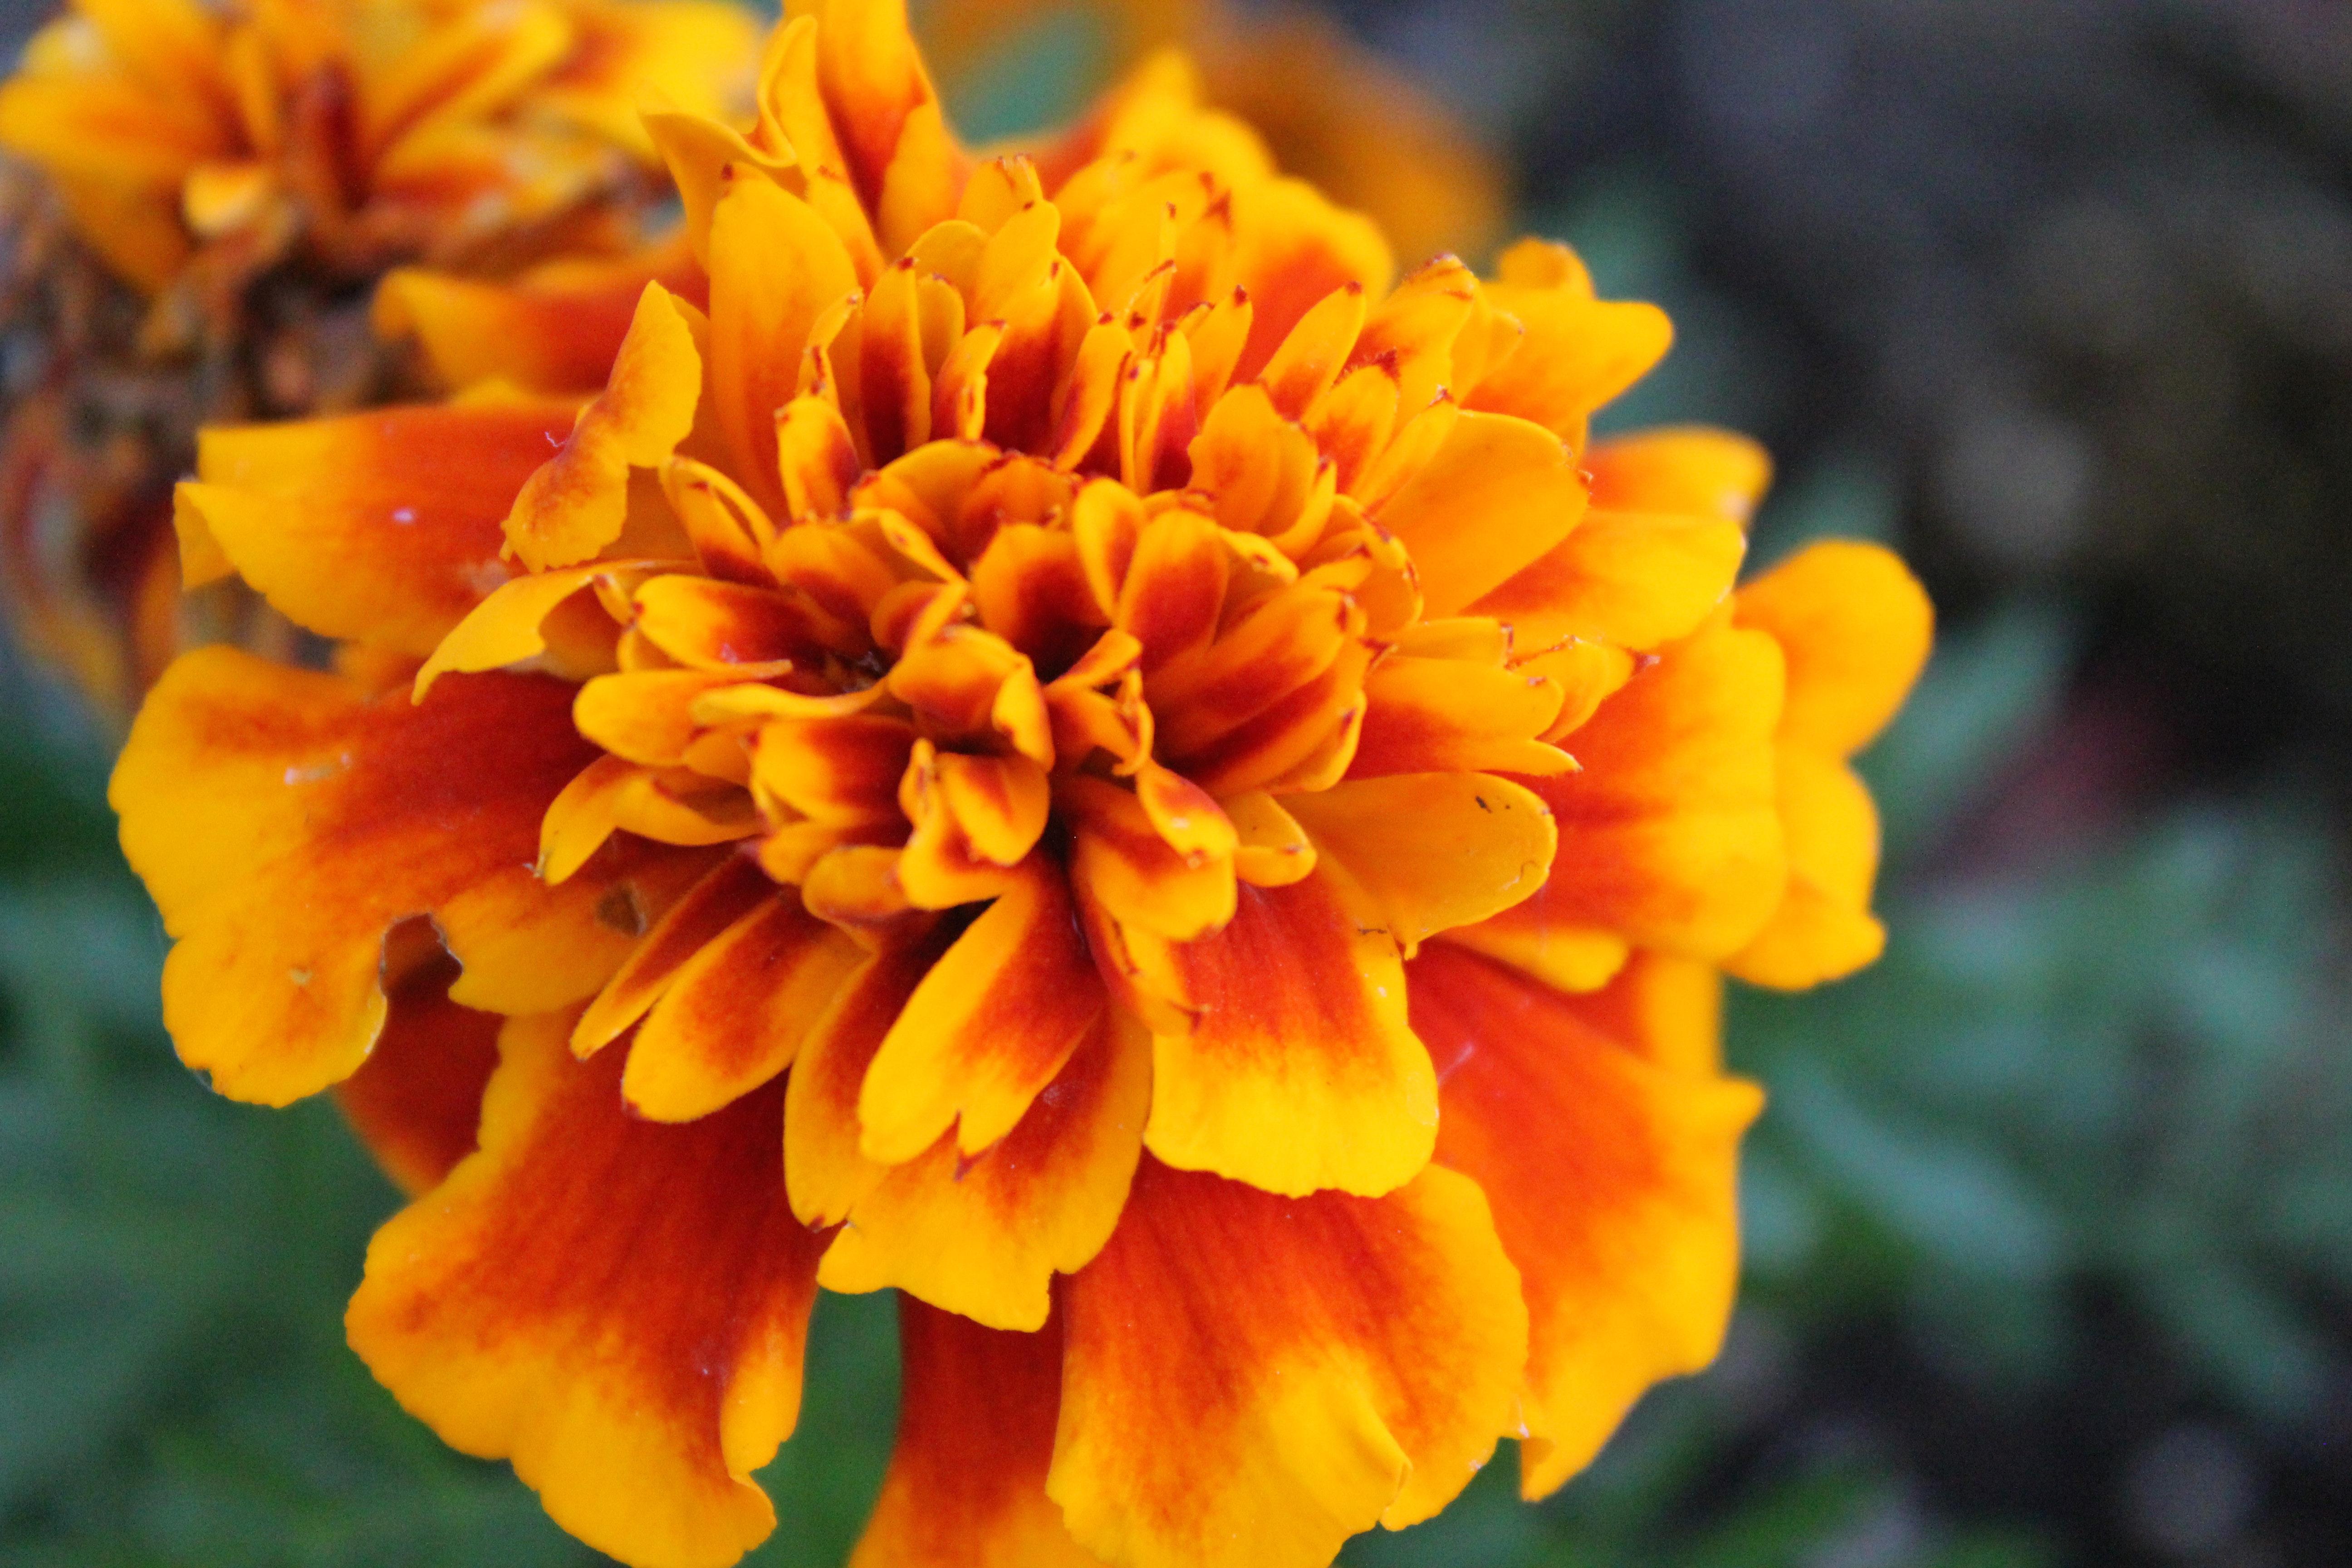 October birth flower the marigold russian flora blog russian october birth flower the marigold russian flora blog russian flora blog izmirmasajfo